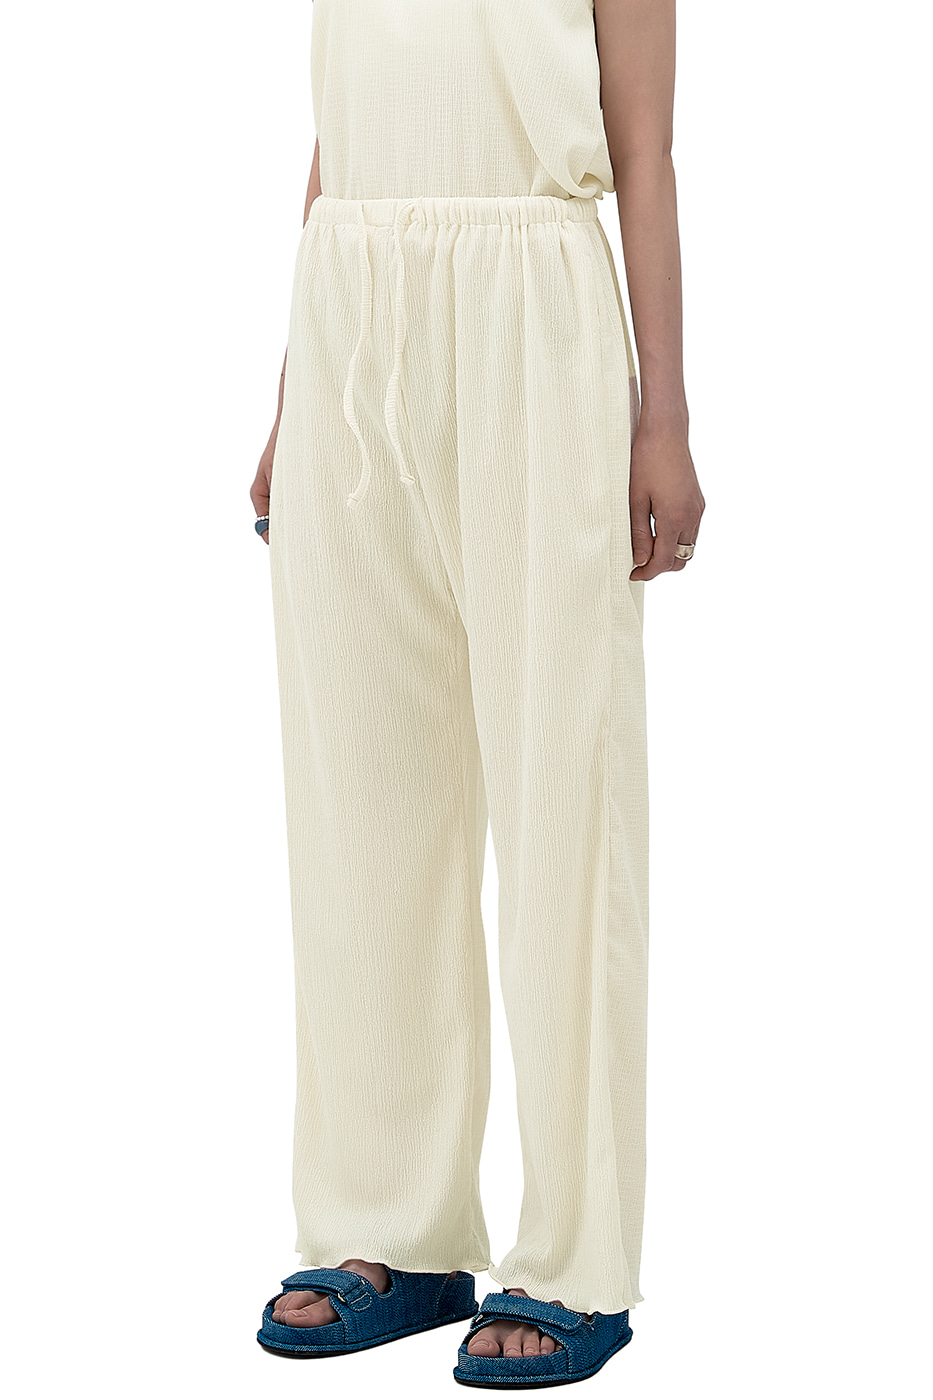 Mod Wrinkle Lounge Banding Pants